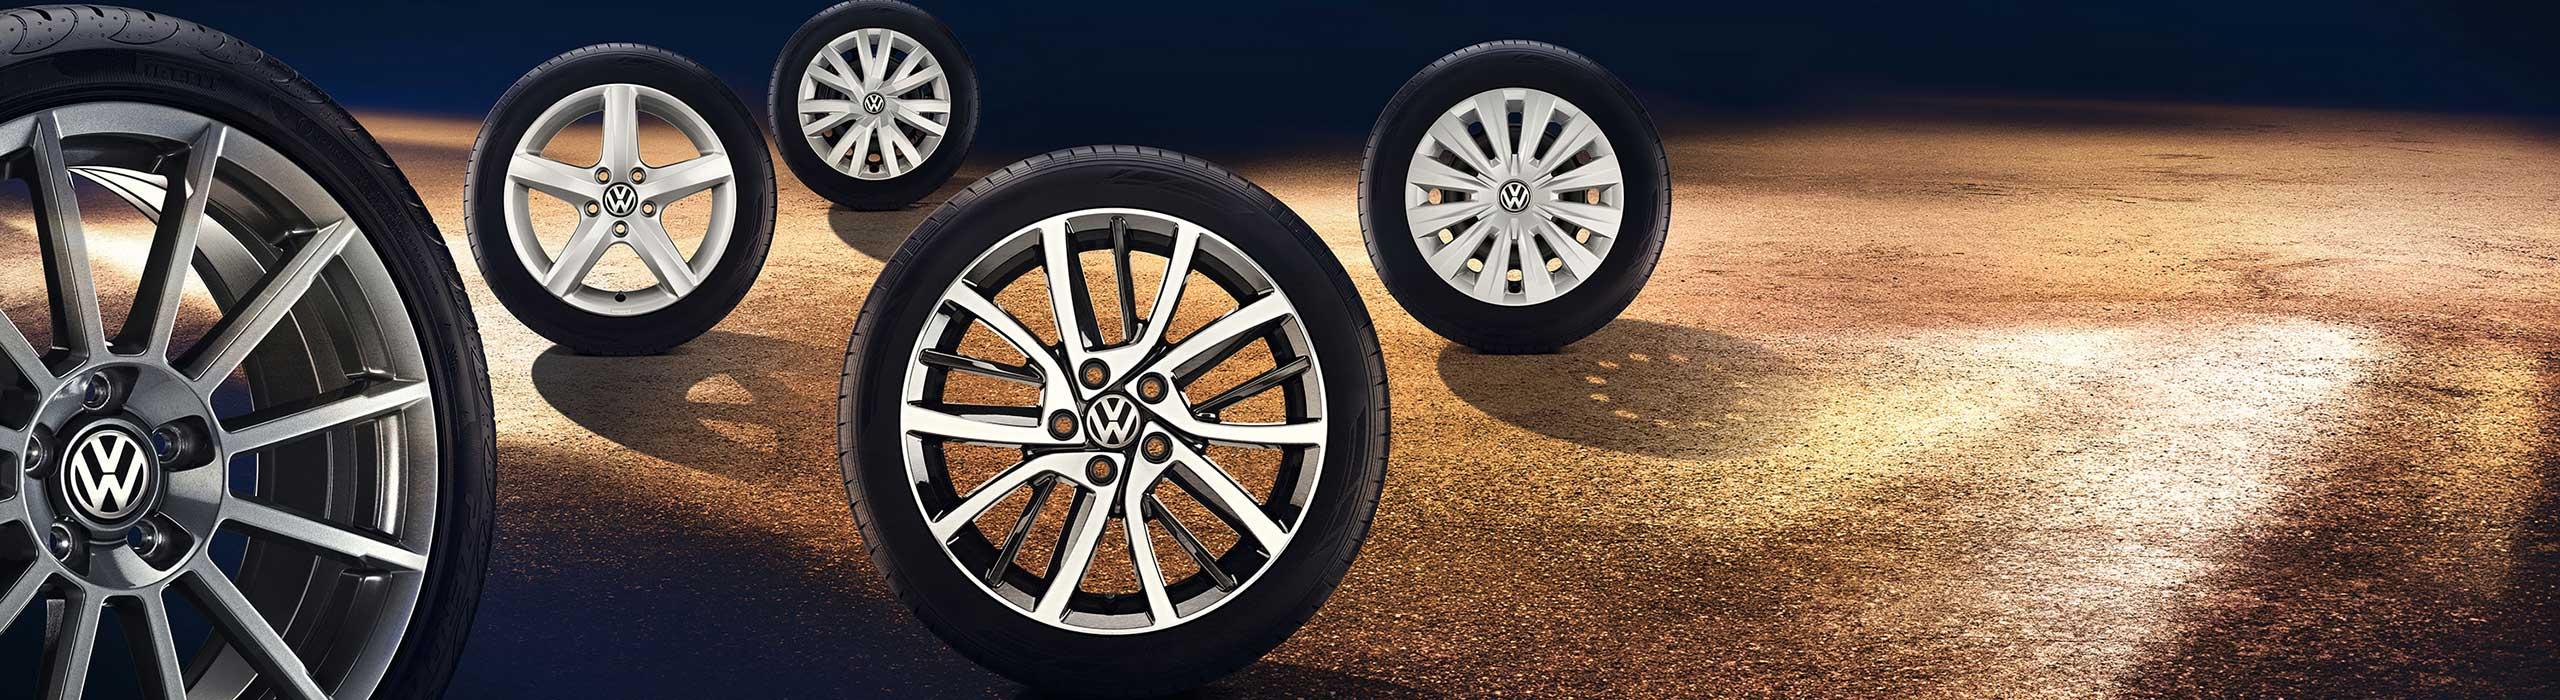 Nya däck hos Toveks Bil